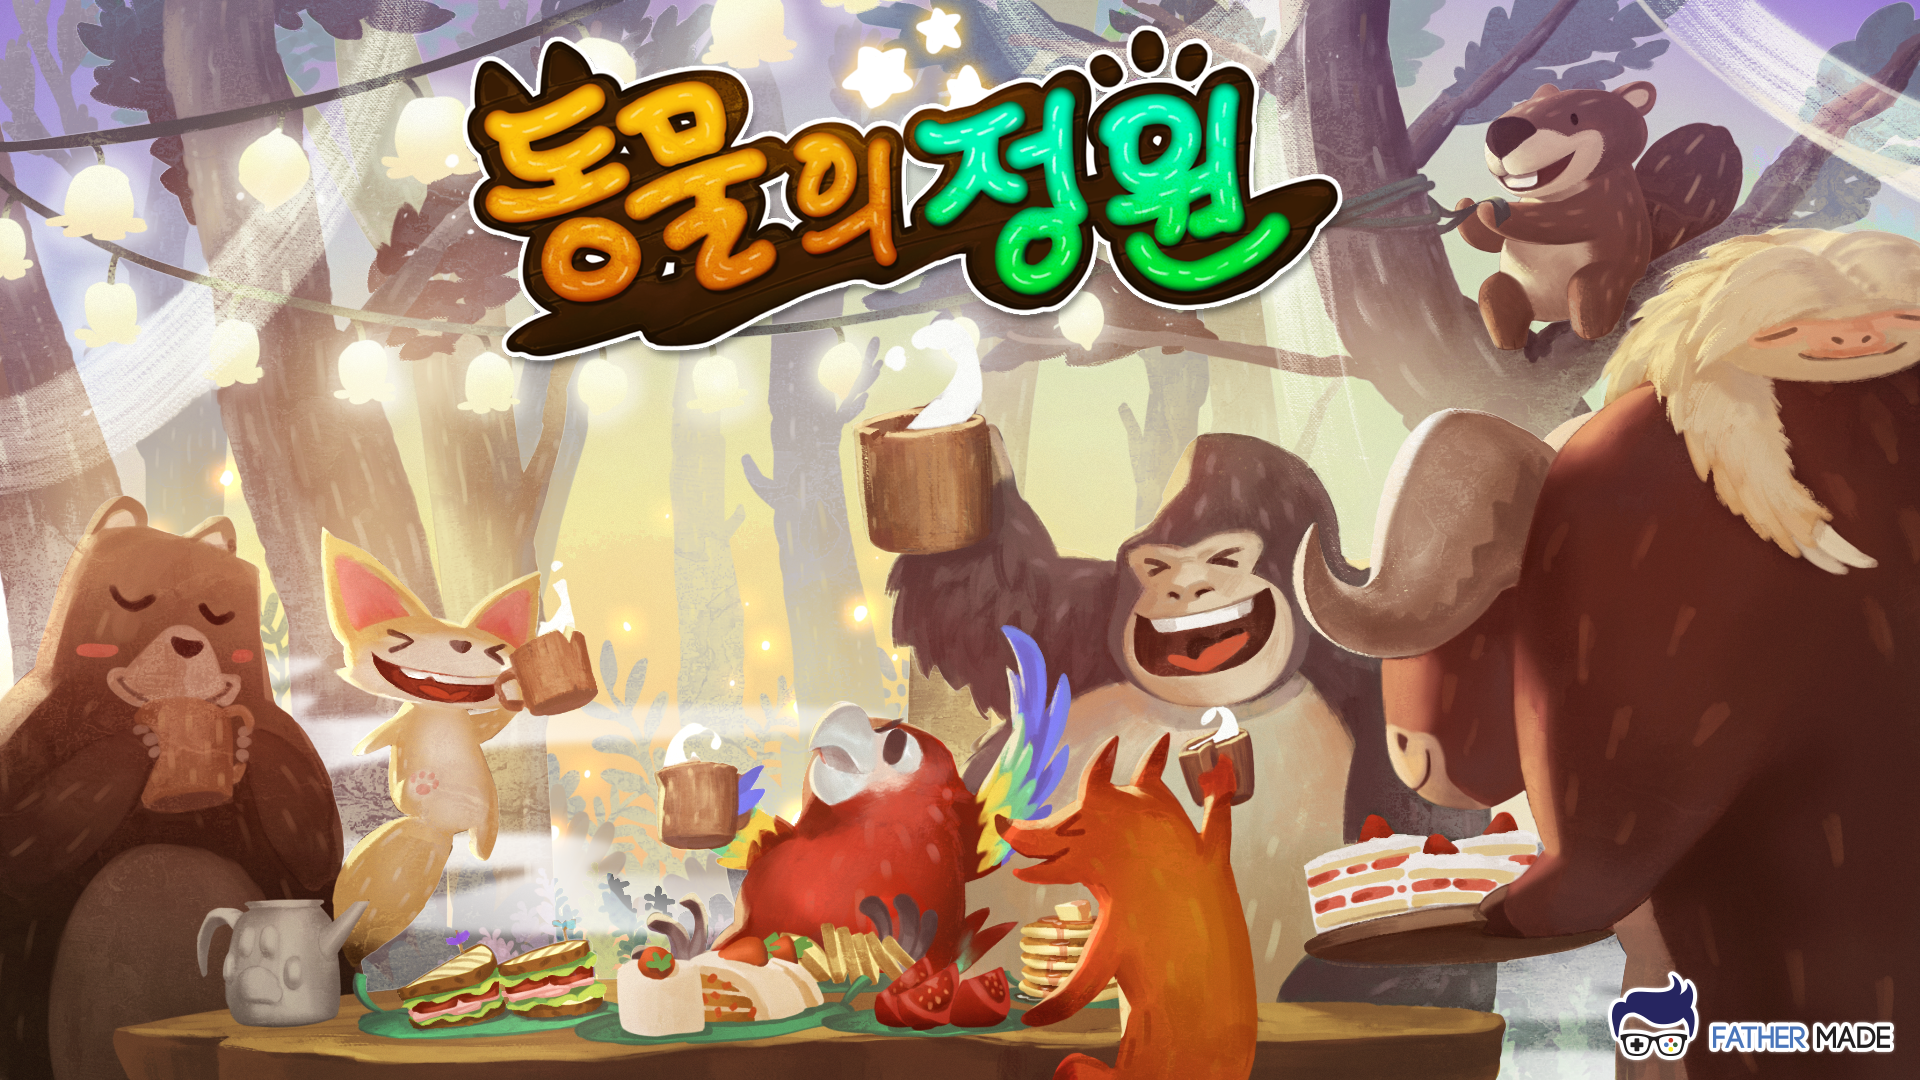 [MWU Korea '18] 동물의 정원 / 파더 메이드